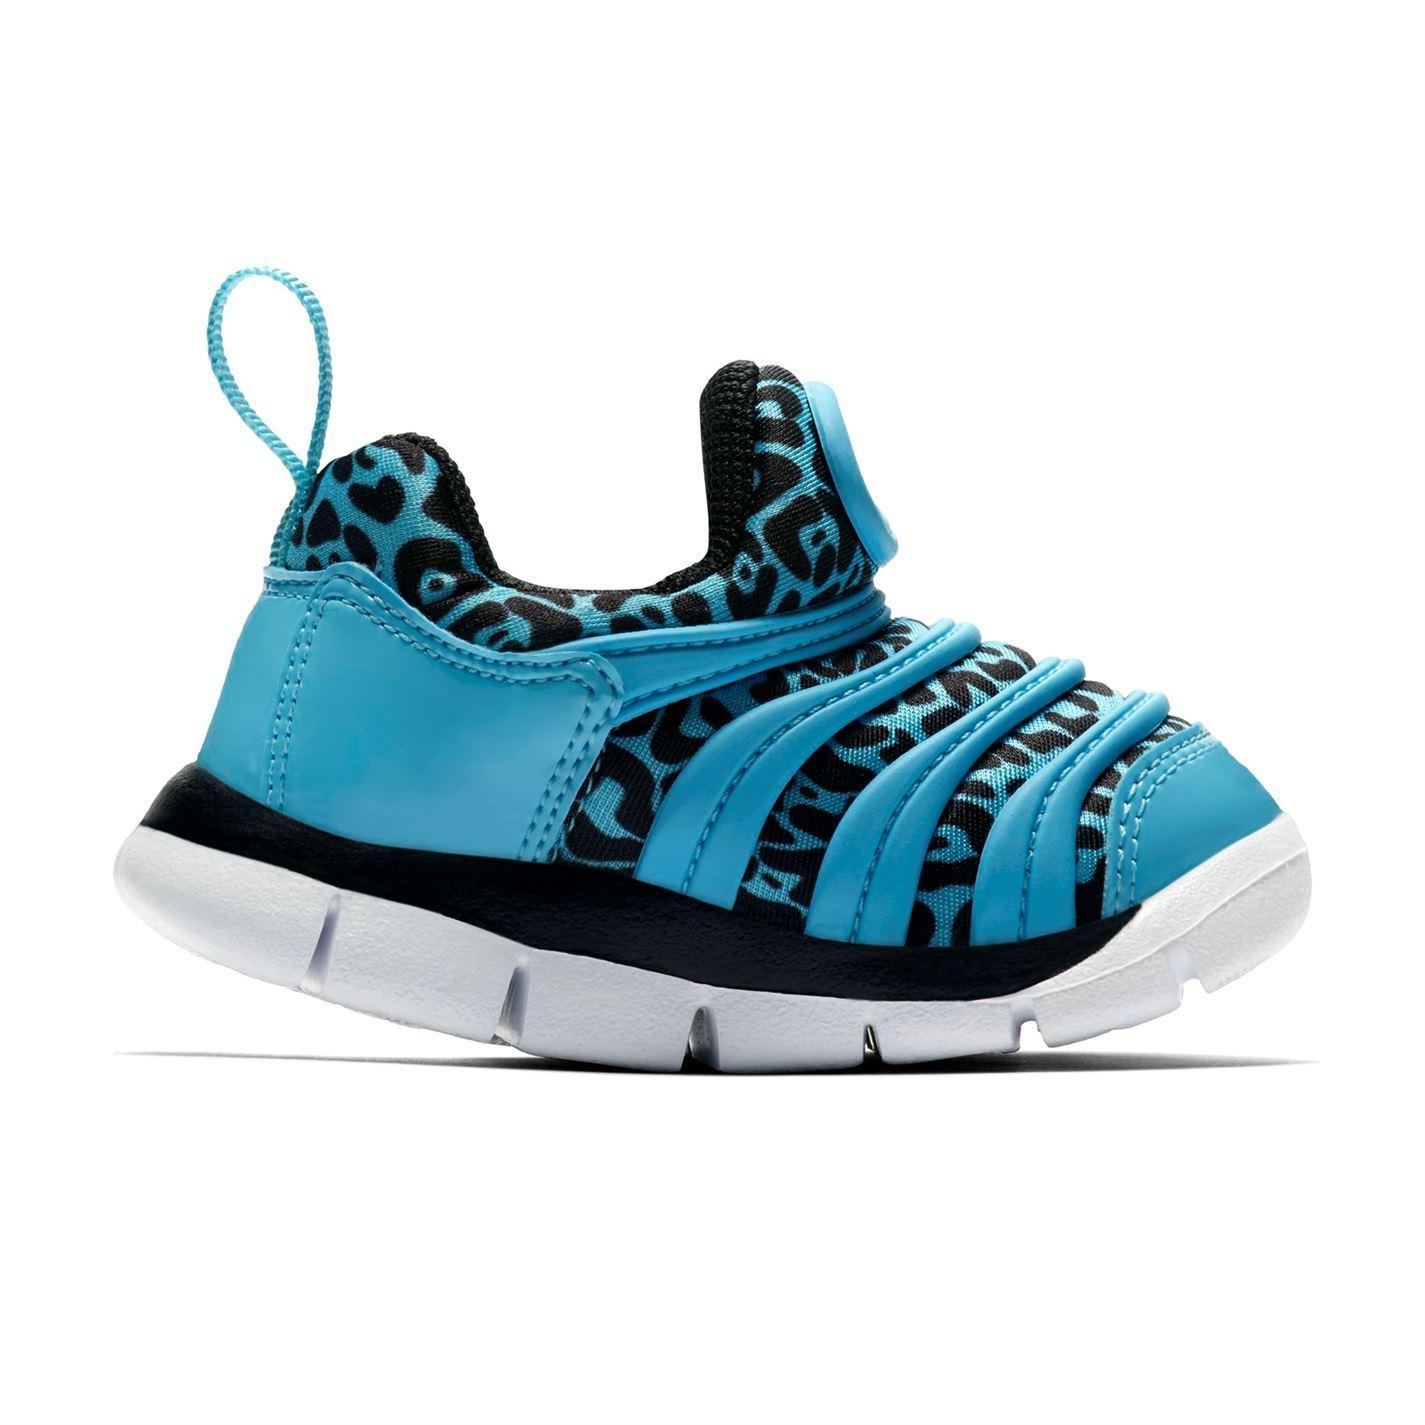 e0c7dd101085cf ... Nike Dynamo Free Shoes Infants Girls Blue Black Trainers Footwear ...